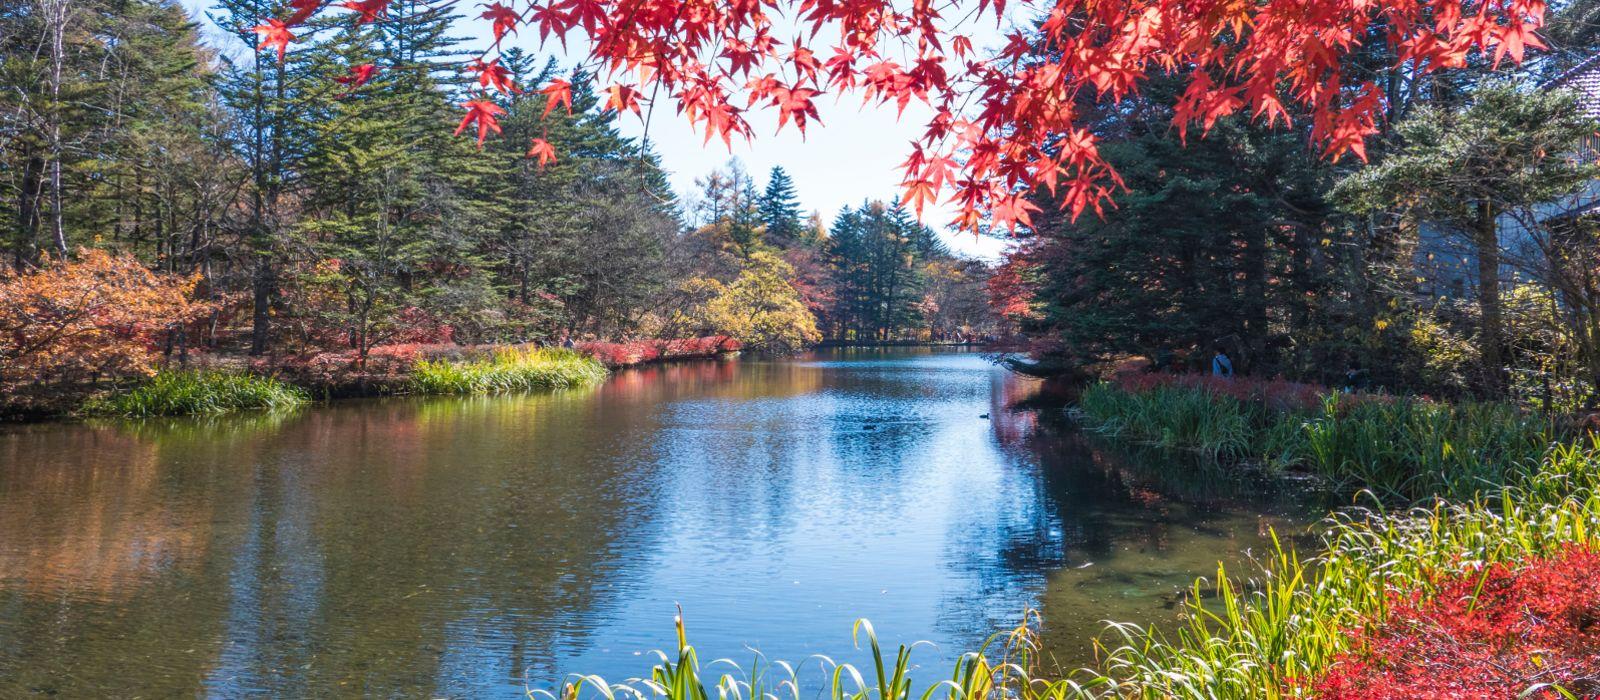 Reiseziel Karuizawa Japan